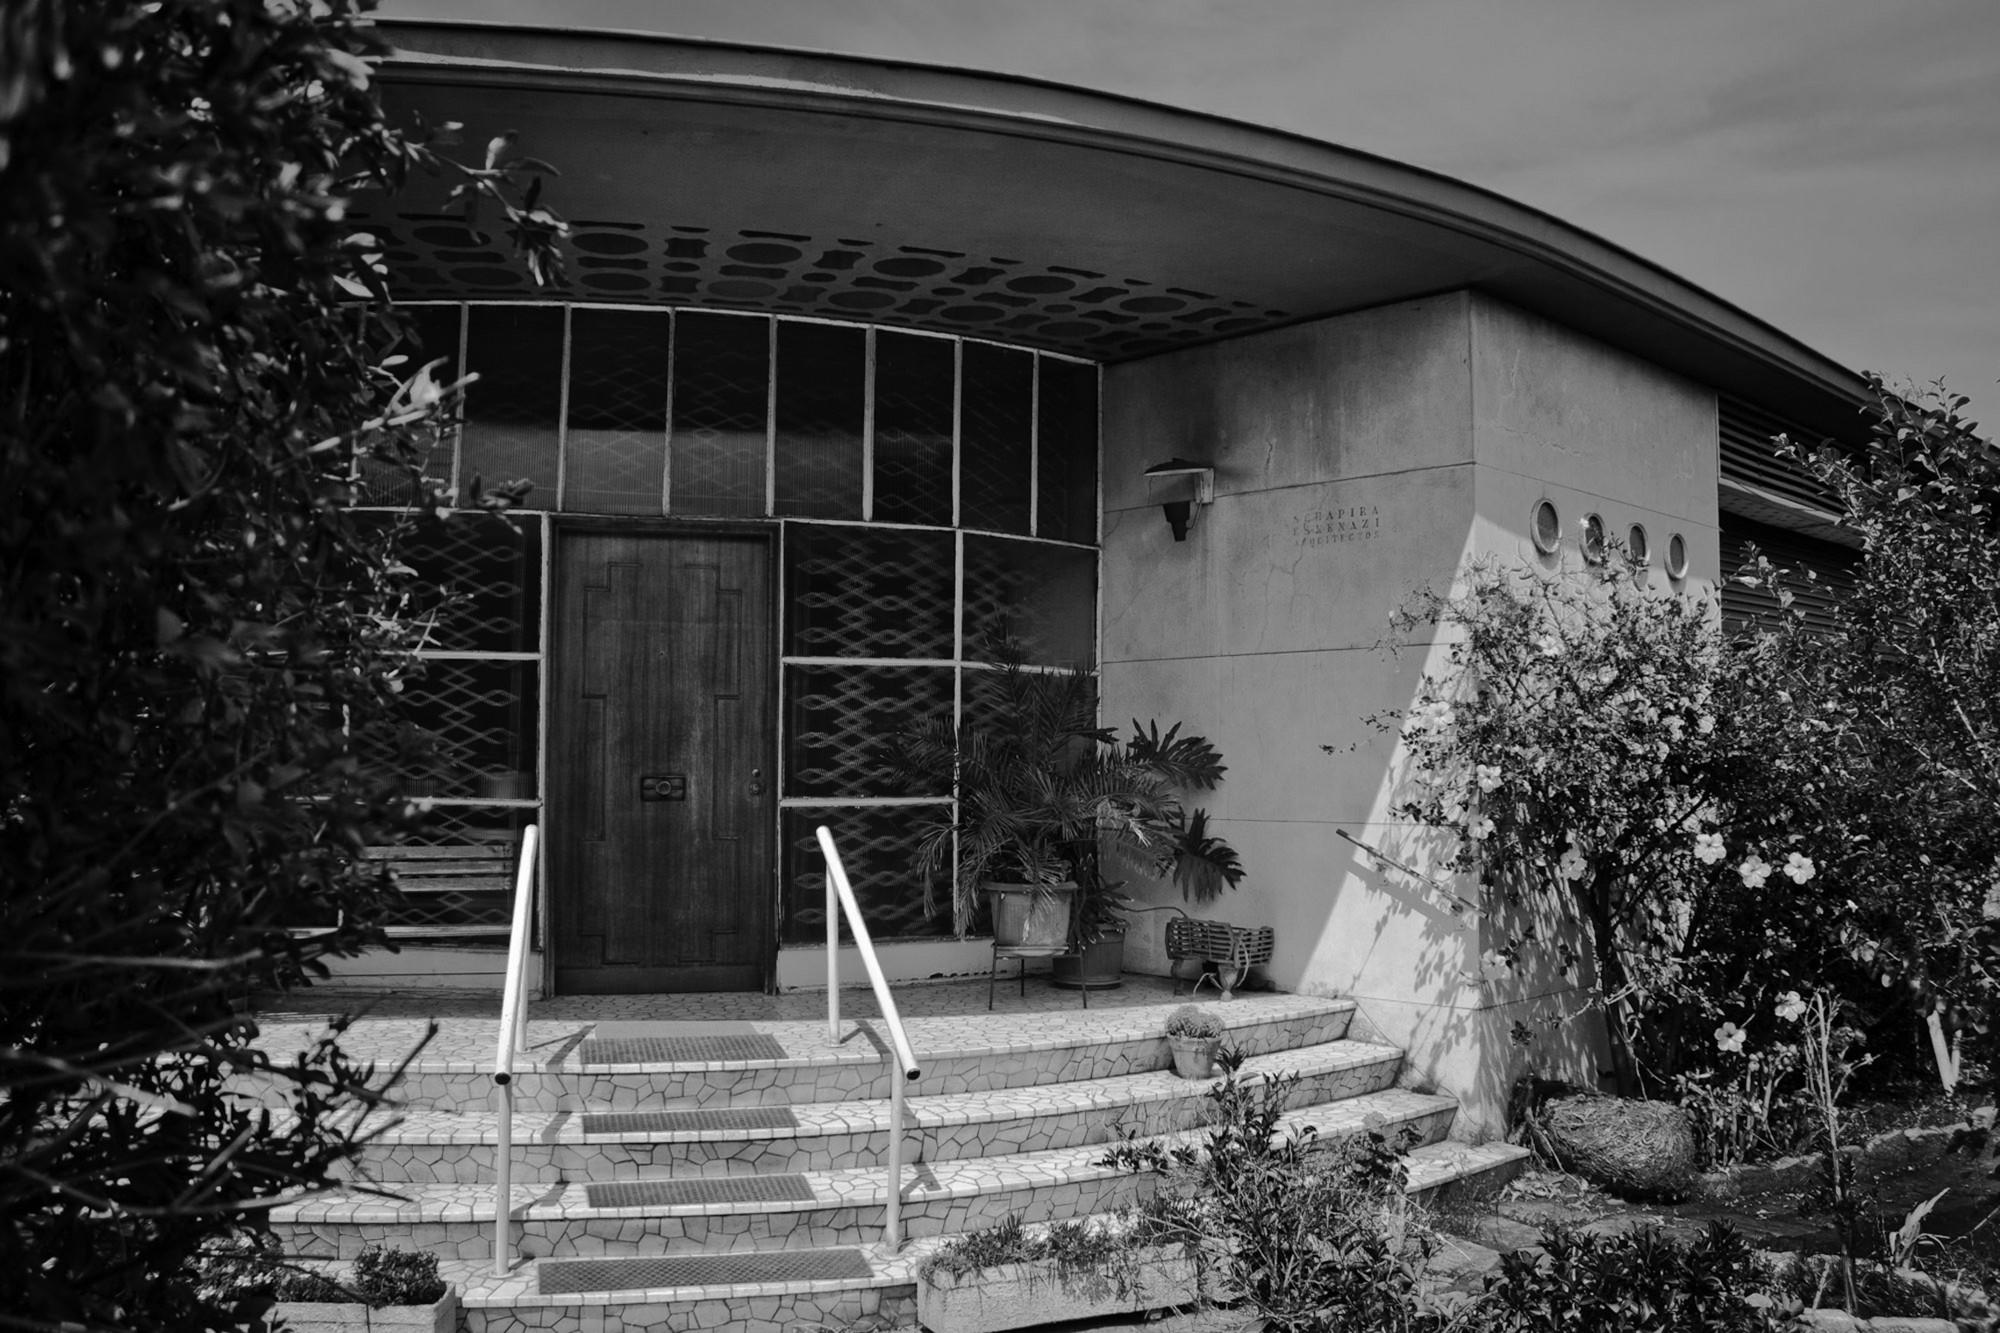 Clásicos de Arquitectura: Casa Guendelman / Abraham Schapira Spaisky, Raquel Eskenazi Rodrich, © Andrés Daly